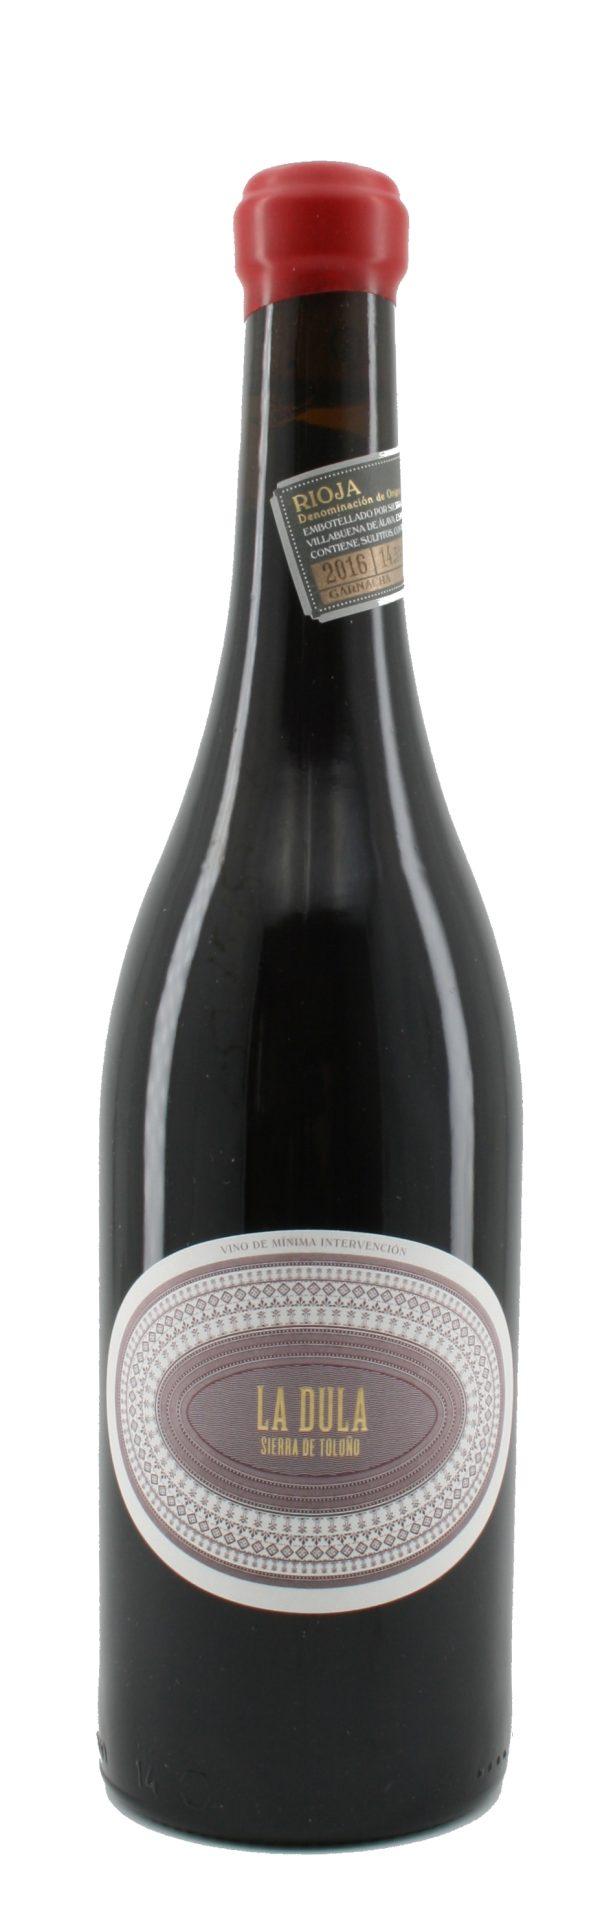 La Dula Rioja 2017